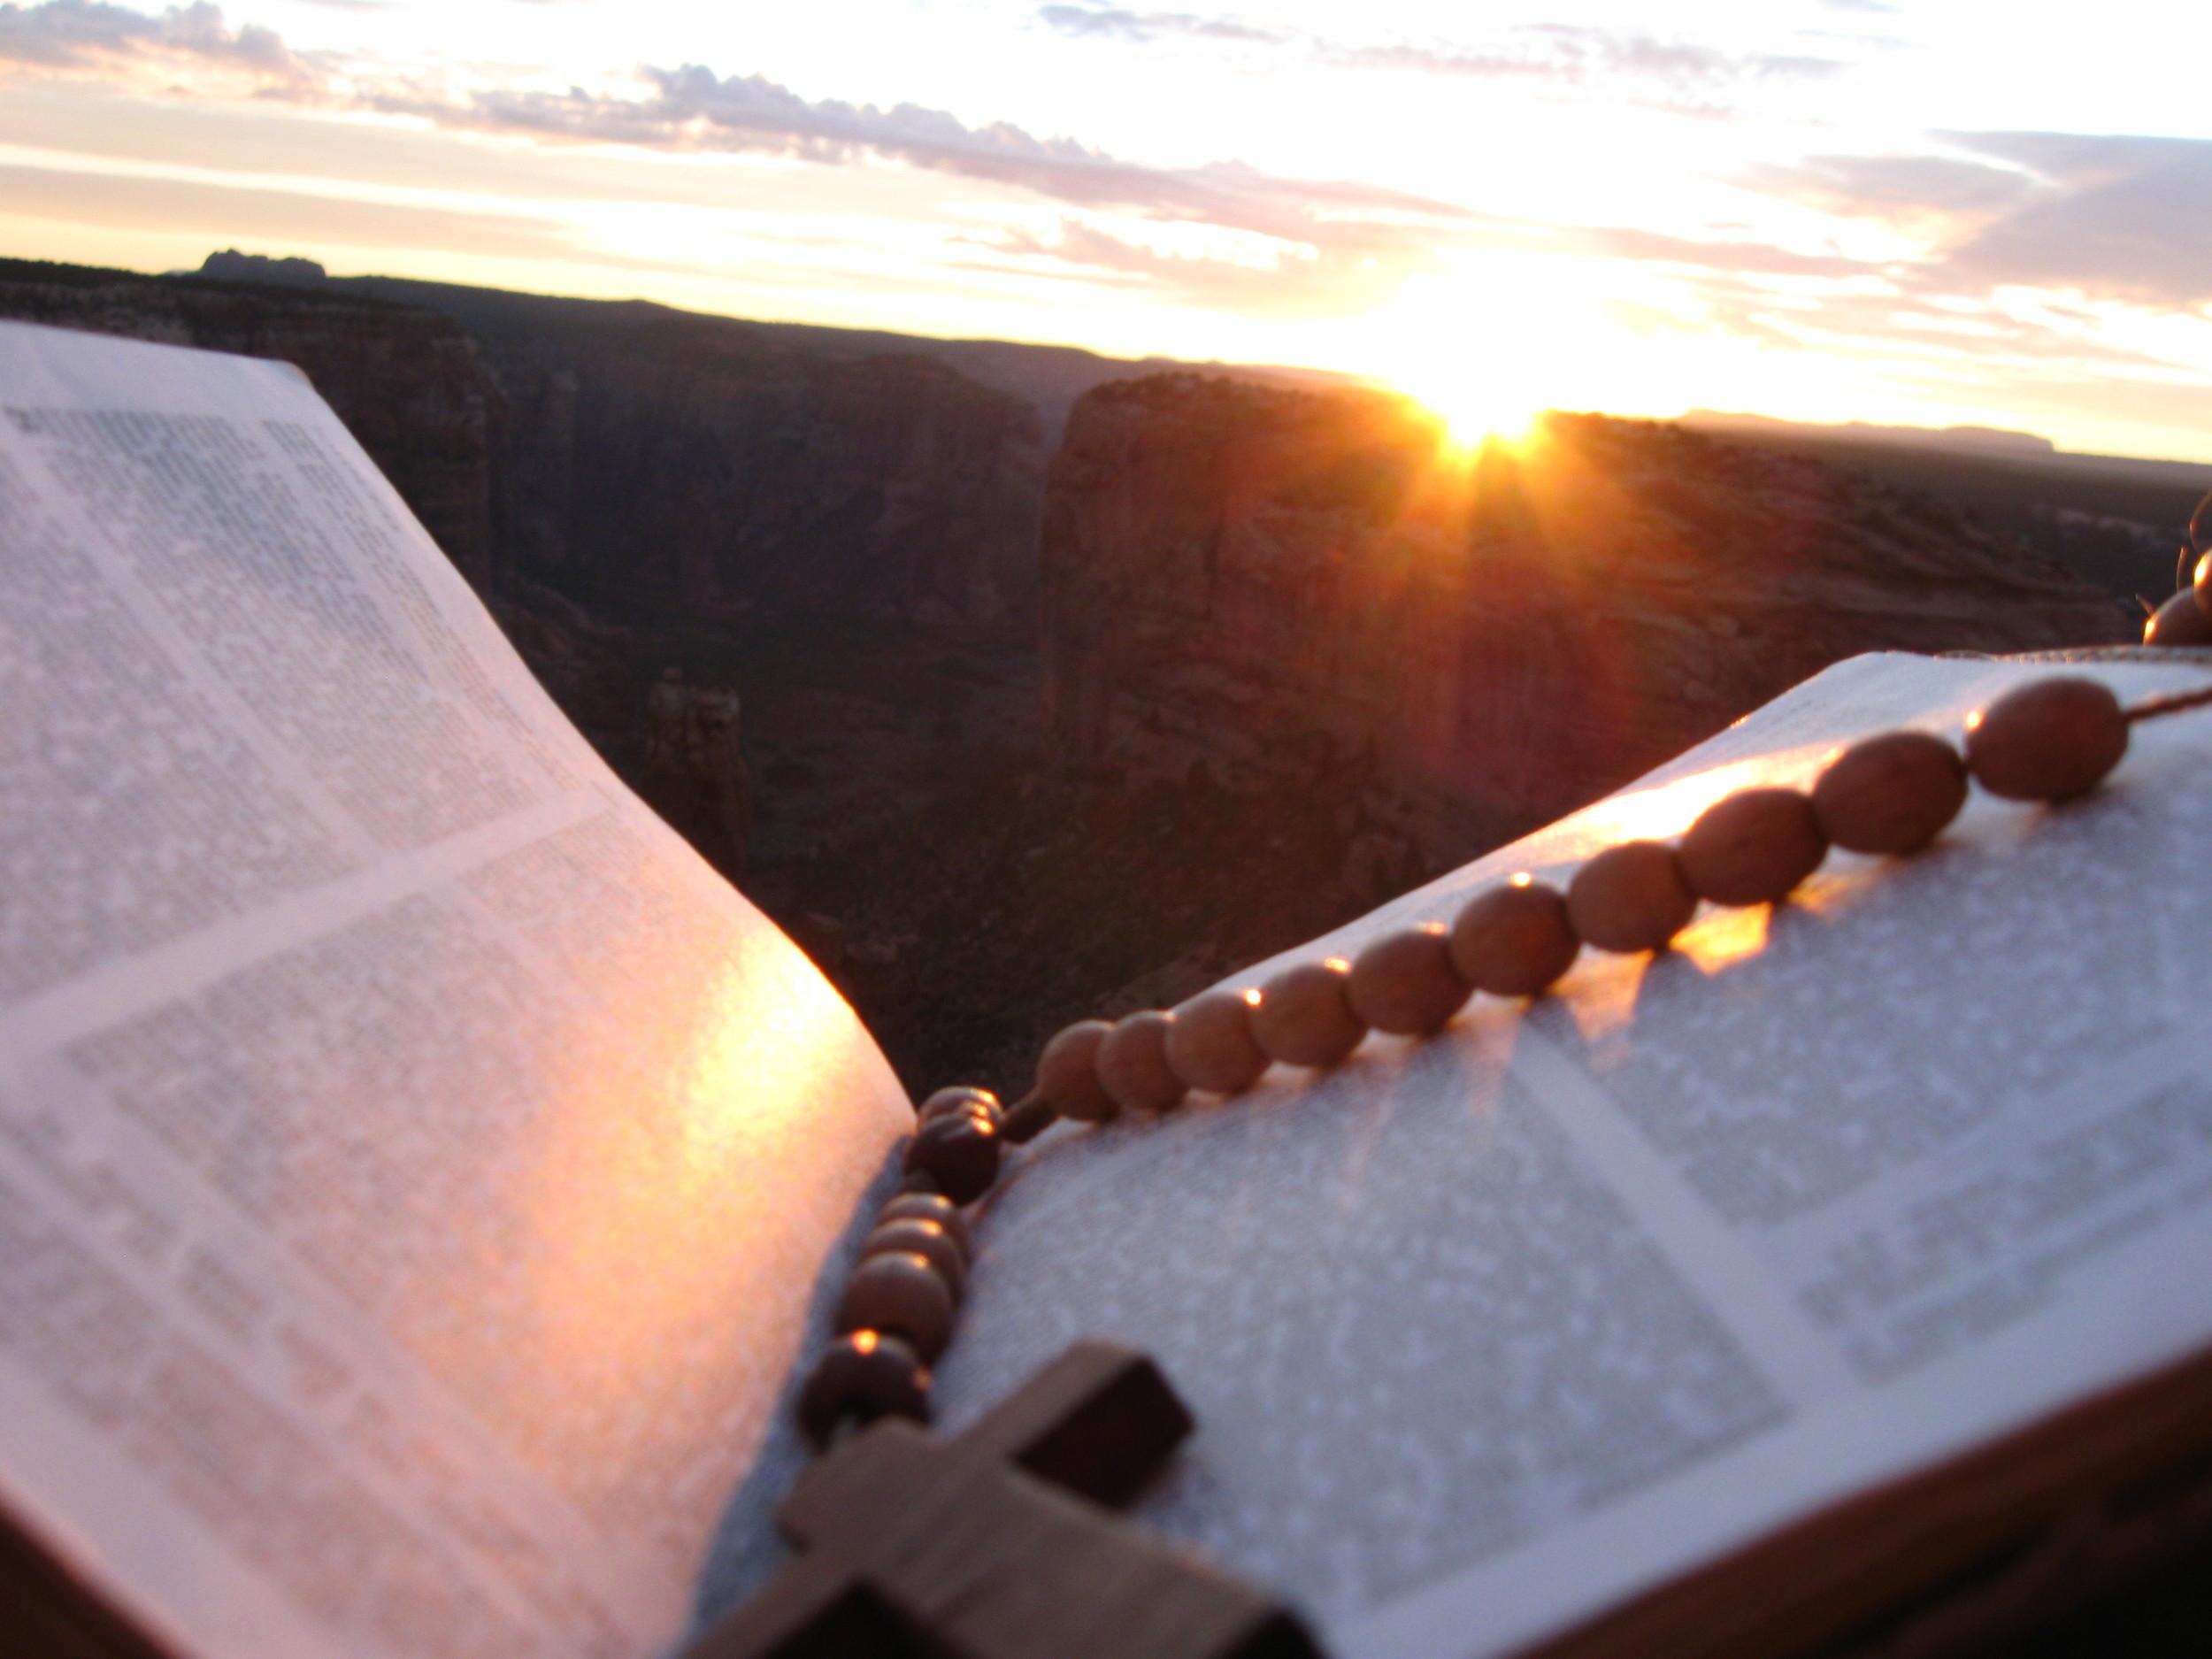 Morning prayer in the Arizona desert.